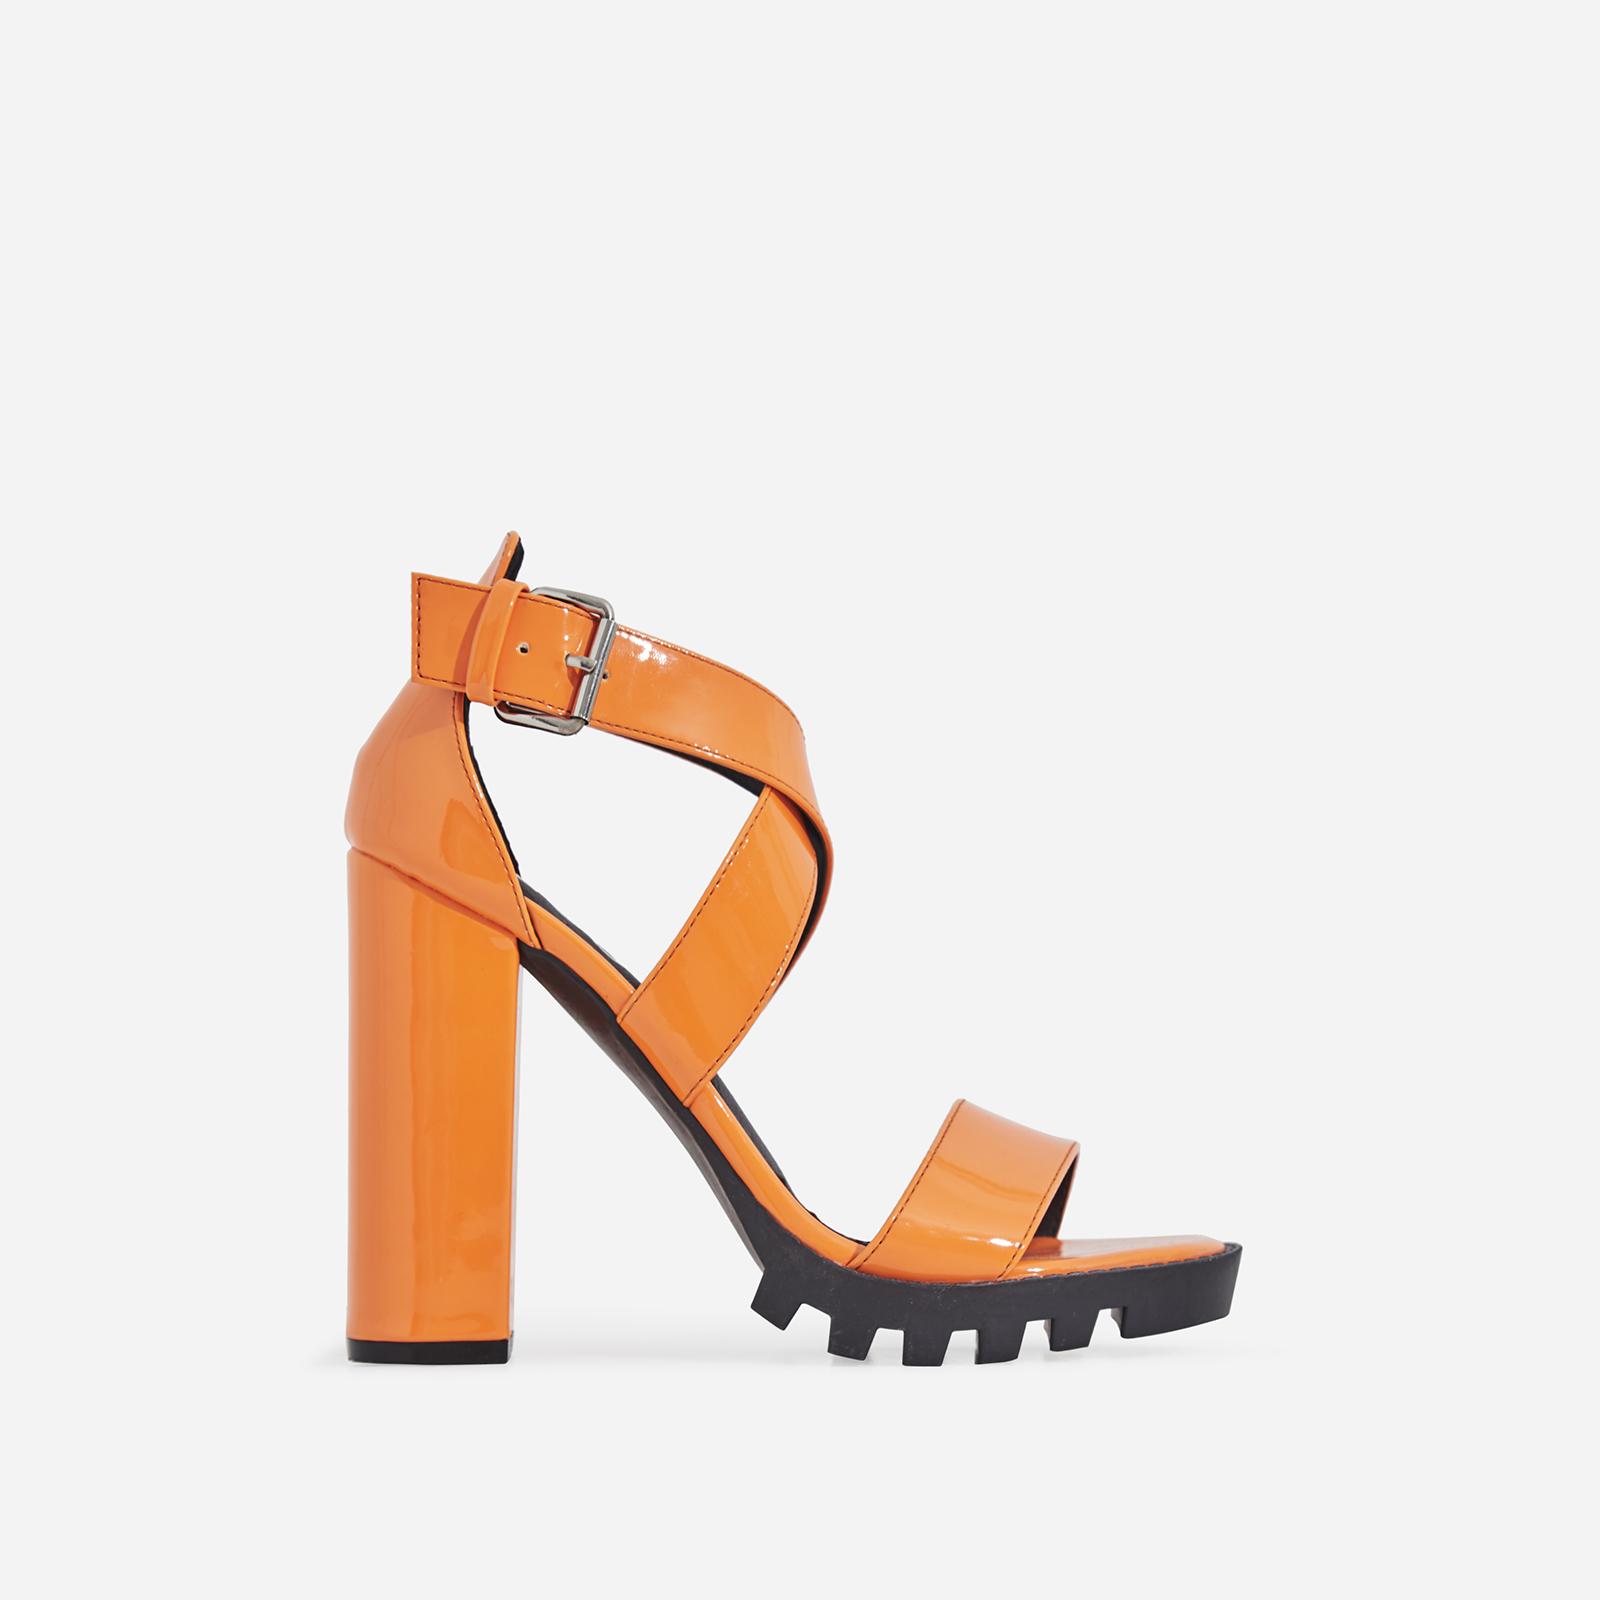 Tori Cleated Sole Block Heel In Orange Patent